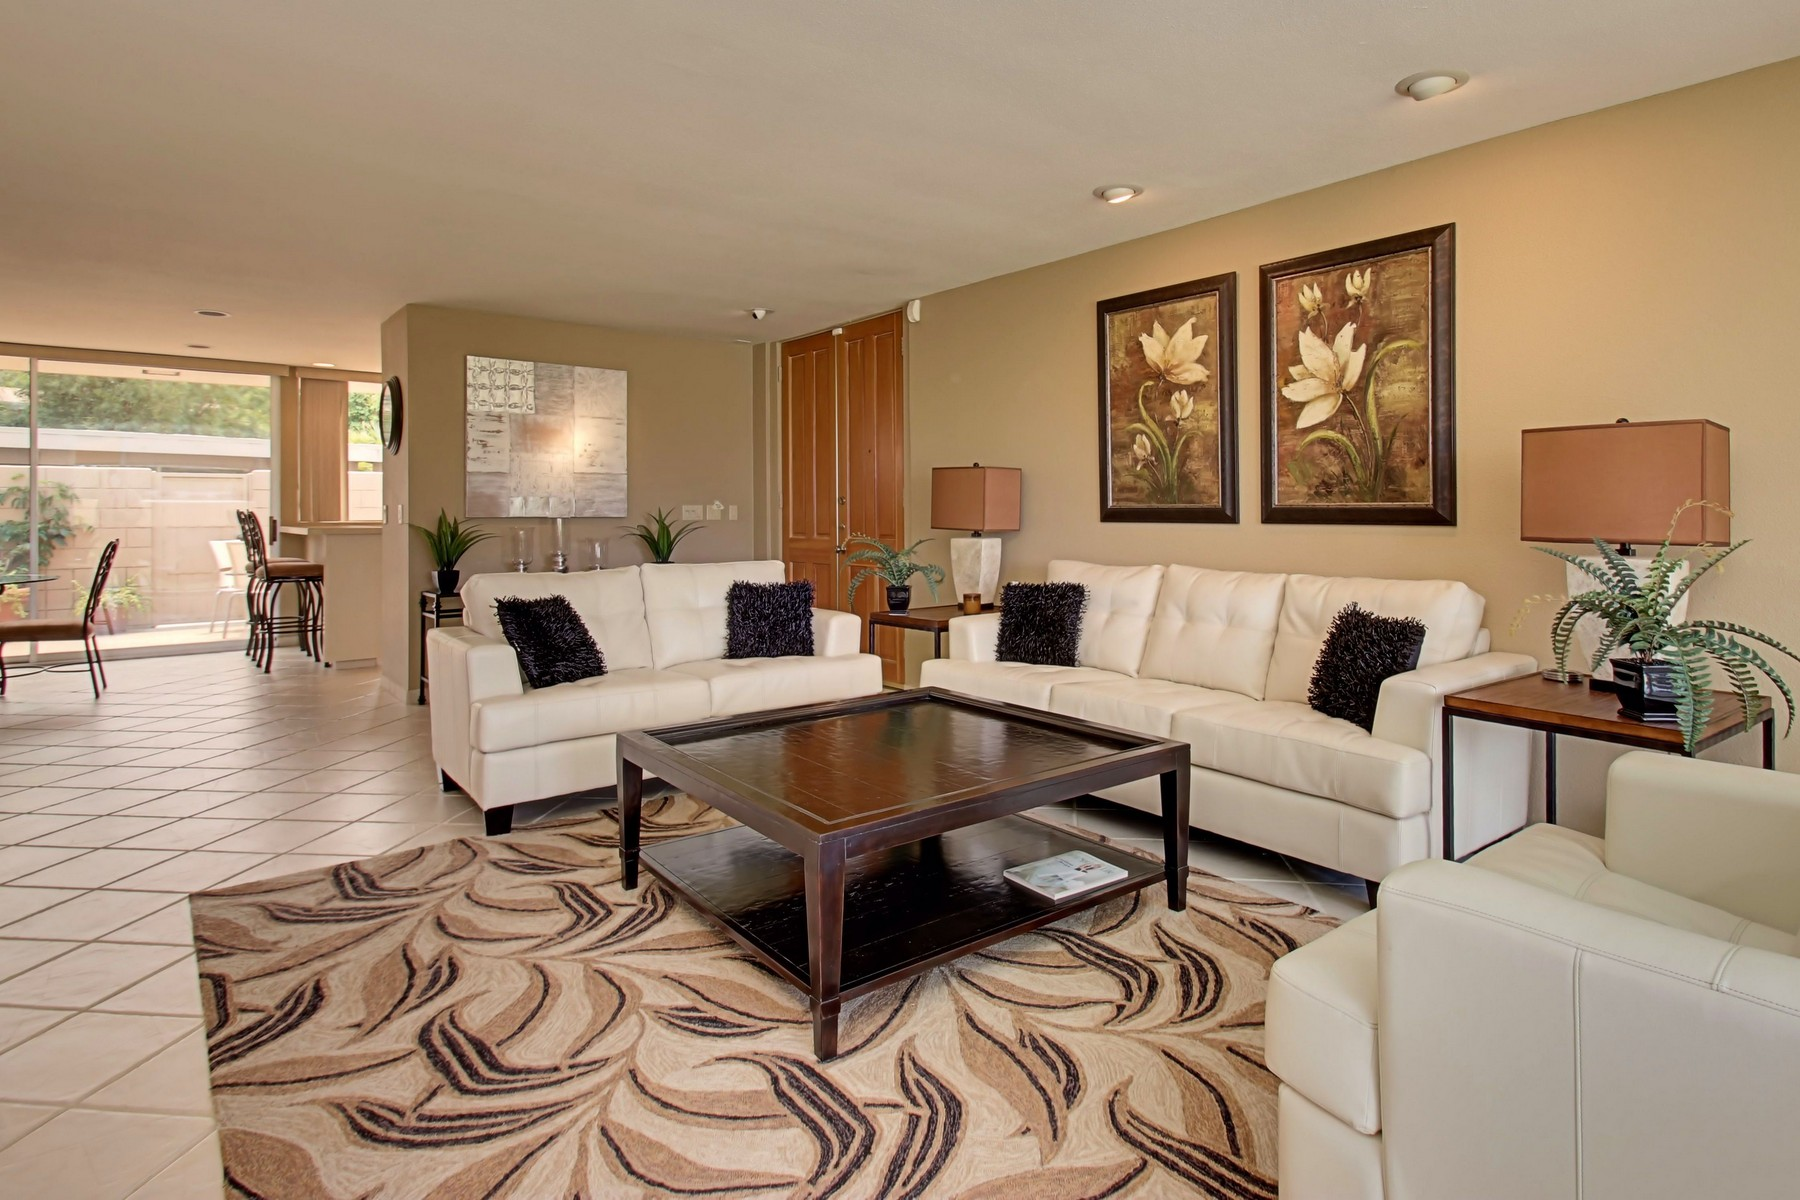 Condominium for Sale at 72913 Willow Street No. 614 Palm Desert, California 92260 United States